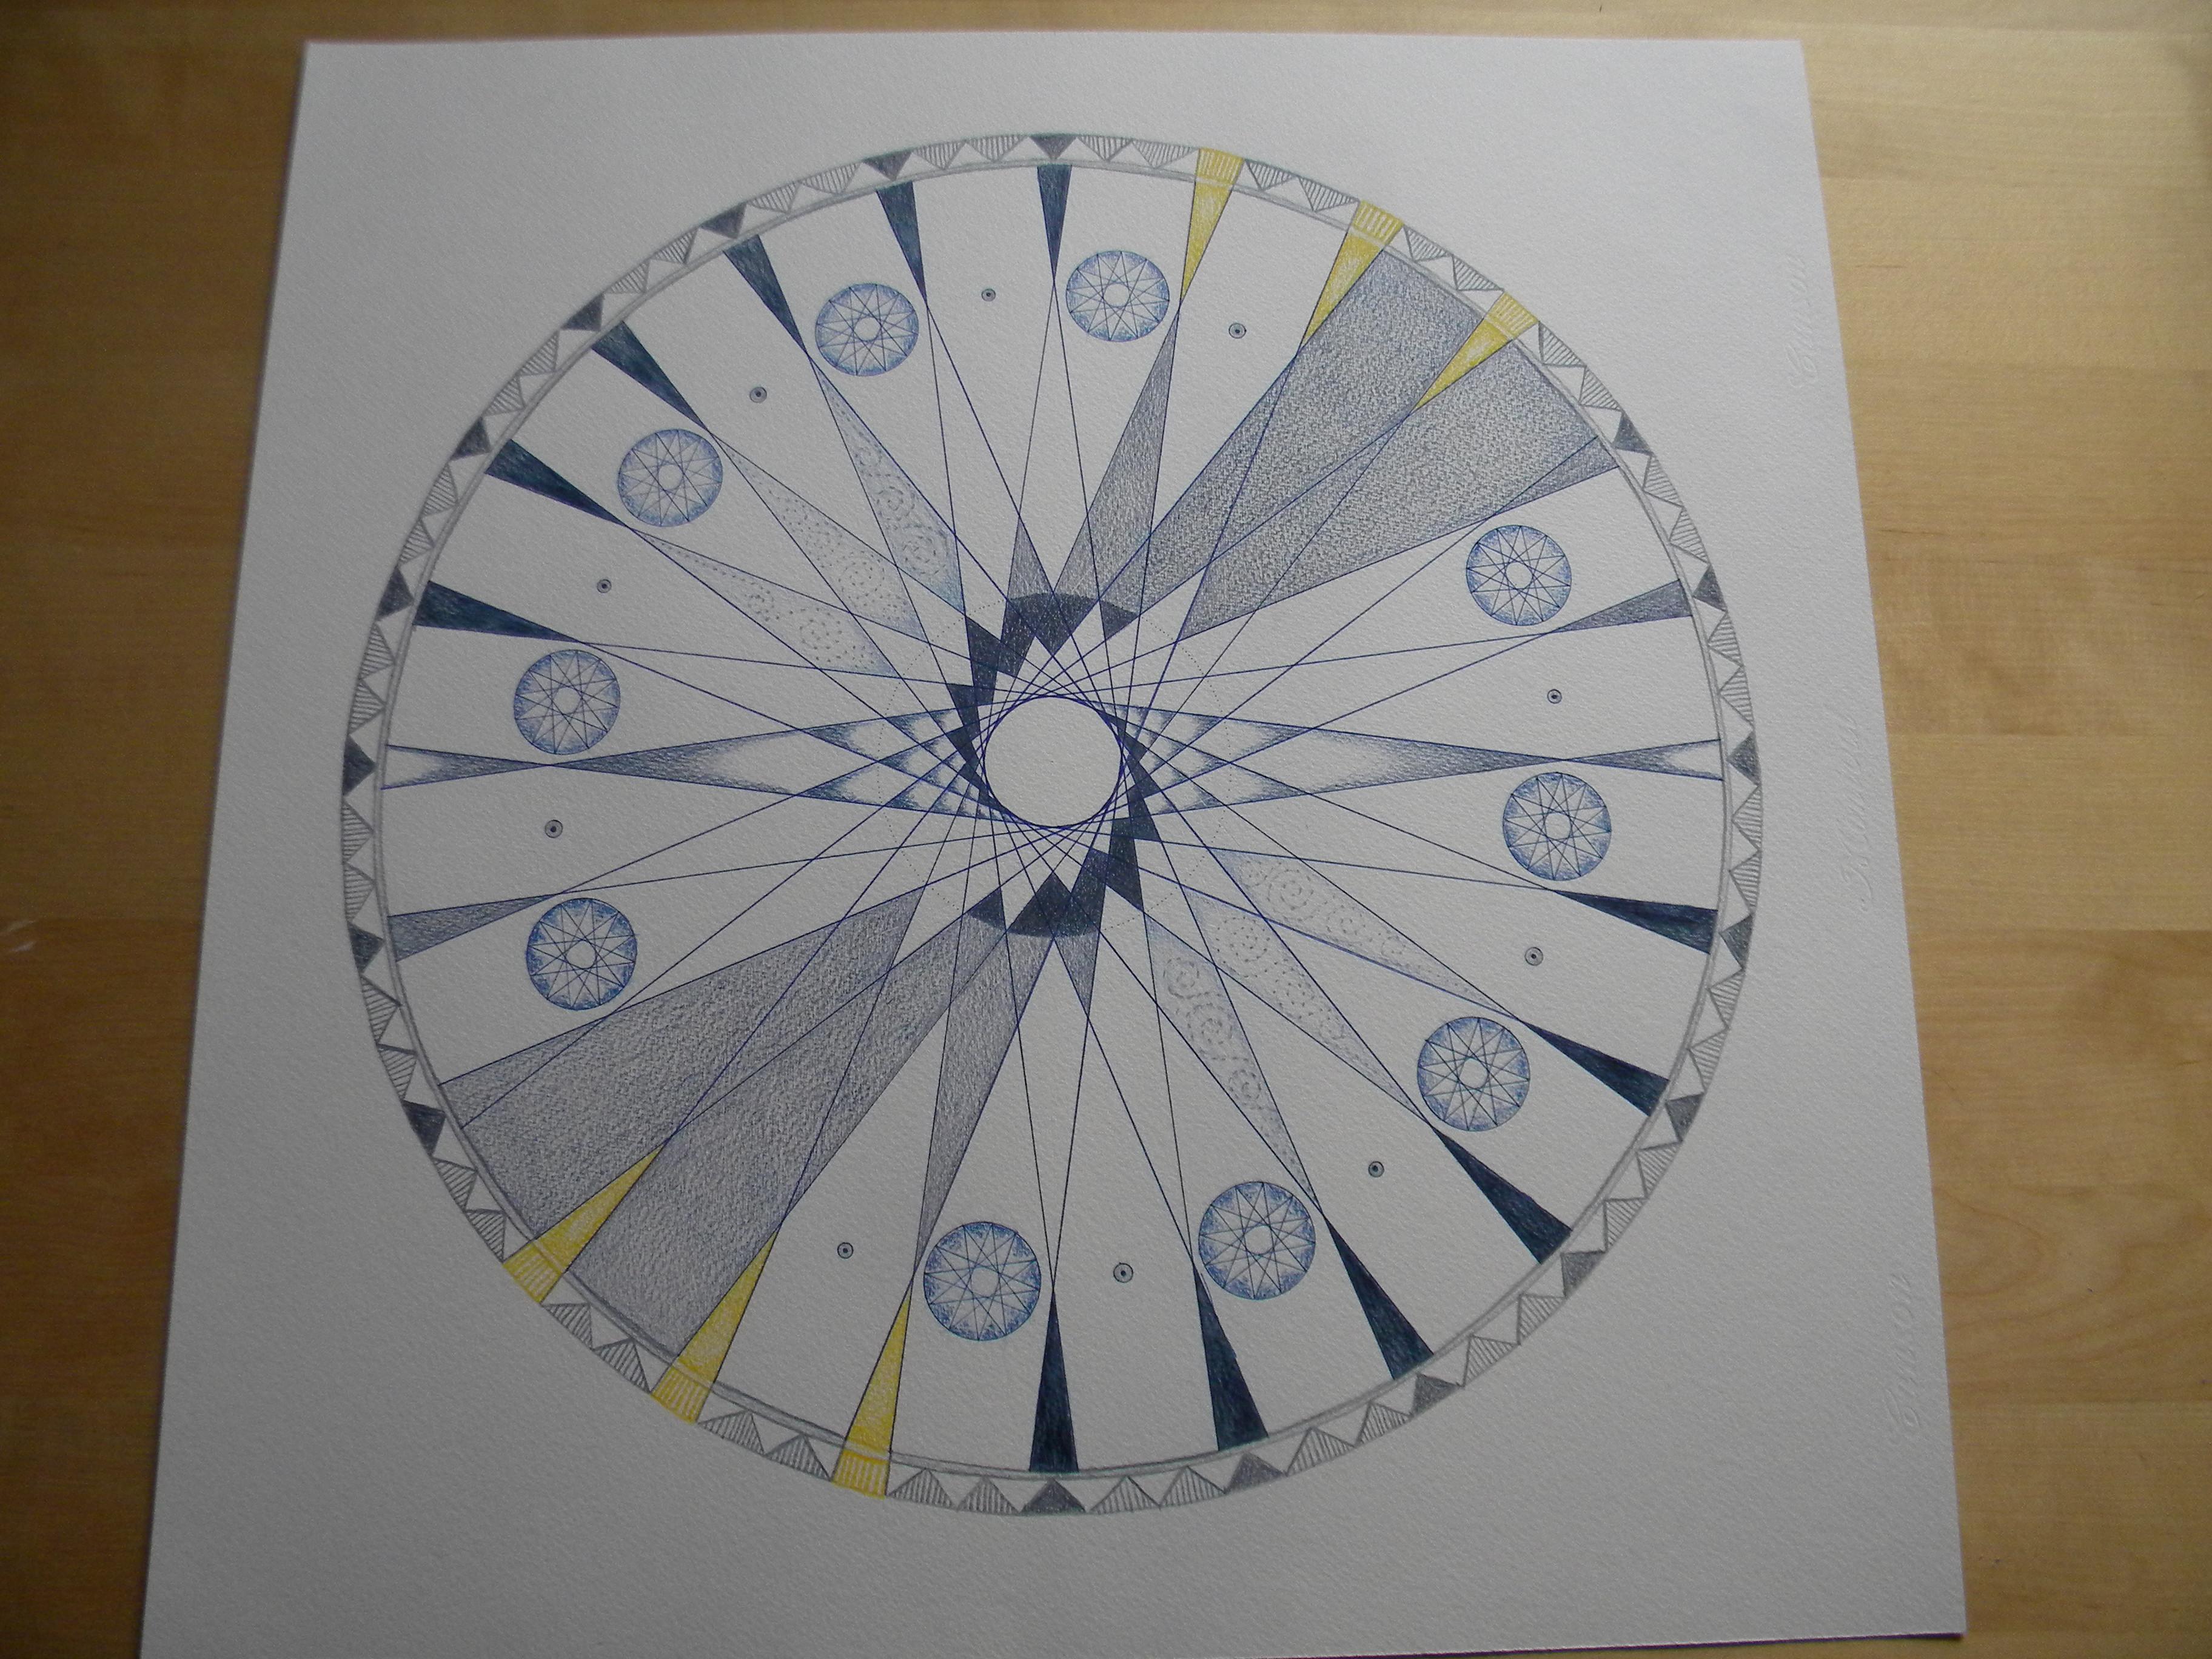 Bedwelming derde oog chackra (zesde chakra) | mandalaplezier #TC44